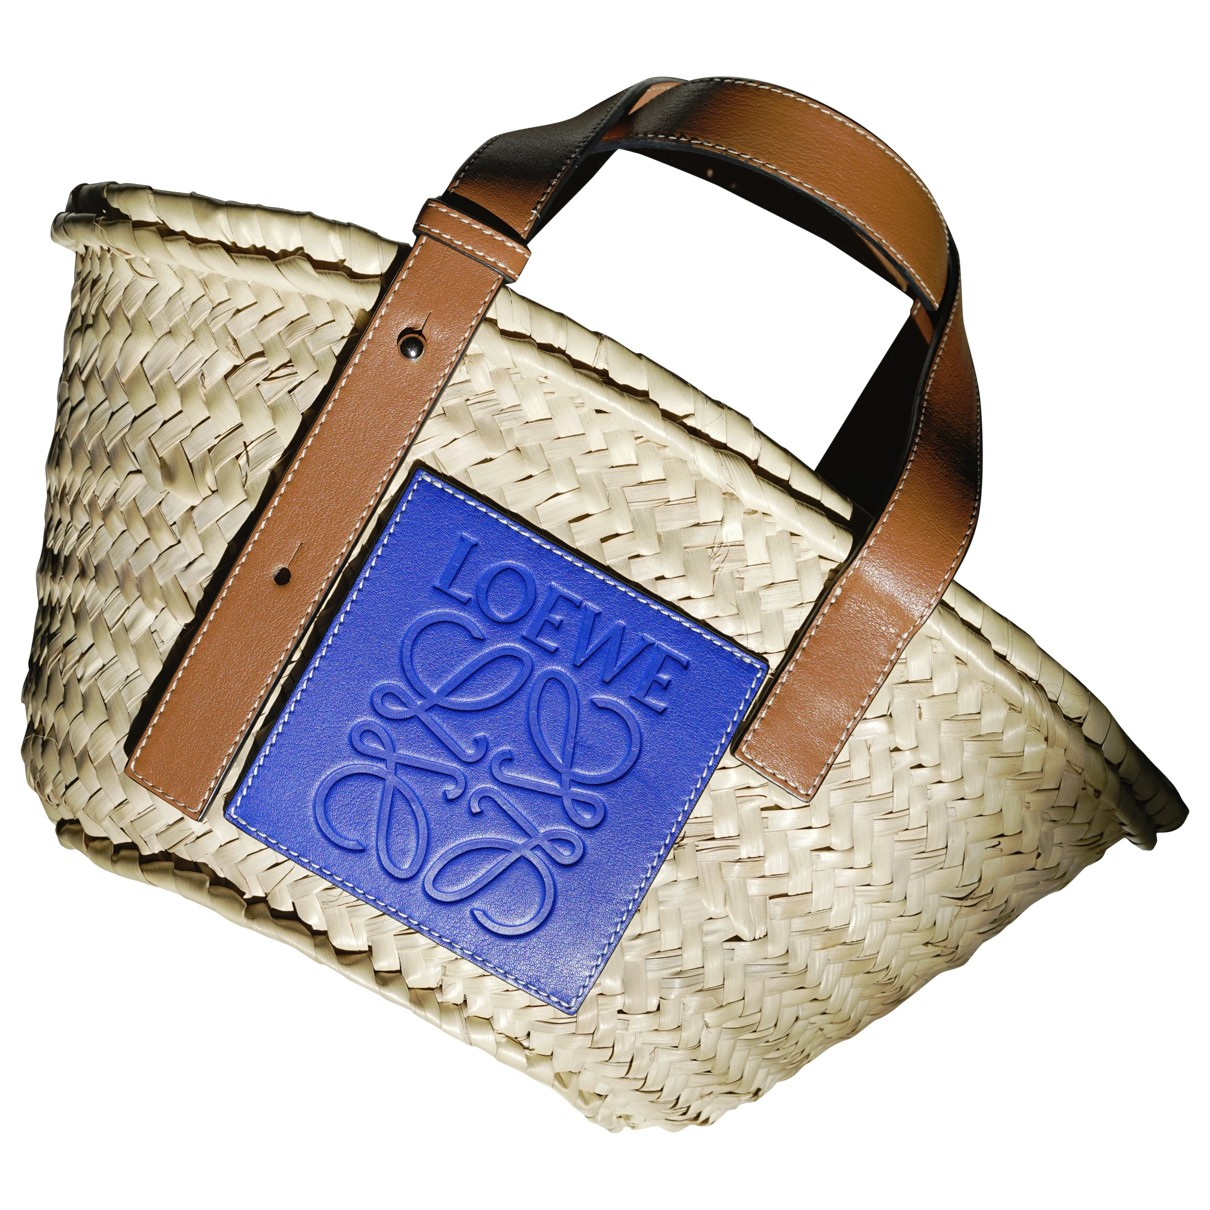 Bolso  Basket Bag Loewe